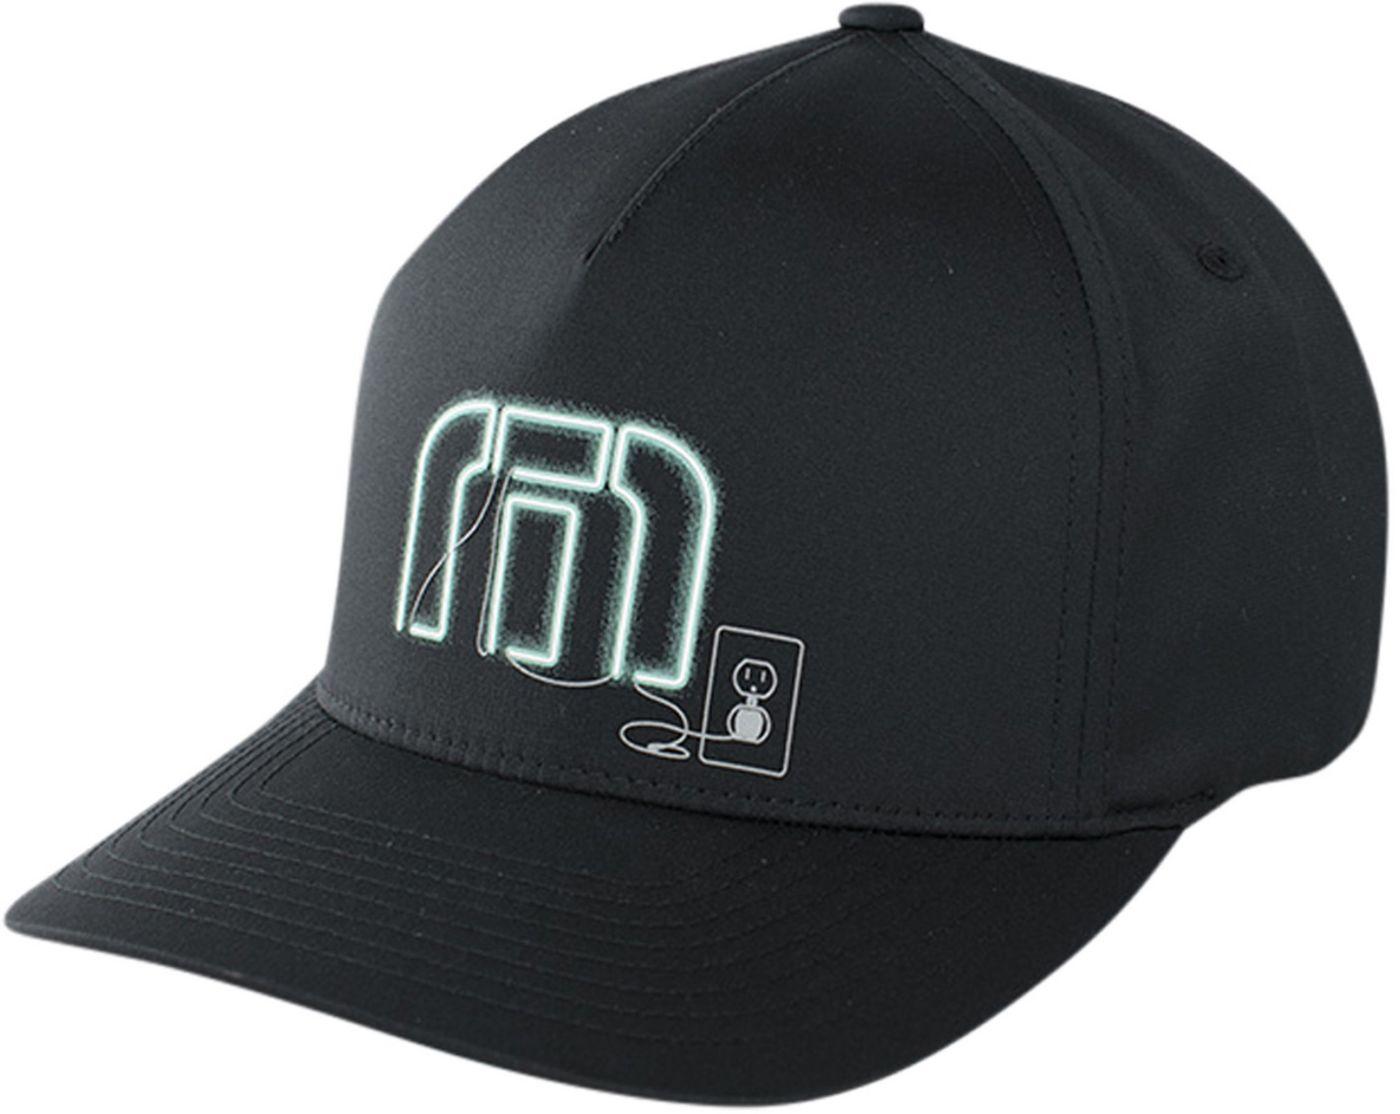 TravisMathew Men's Plugged Golf Hat